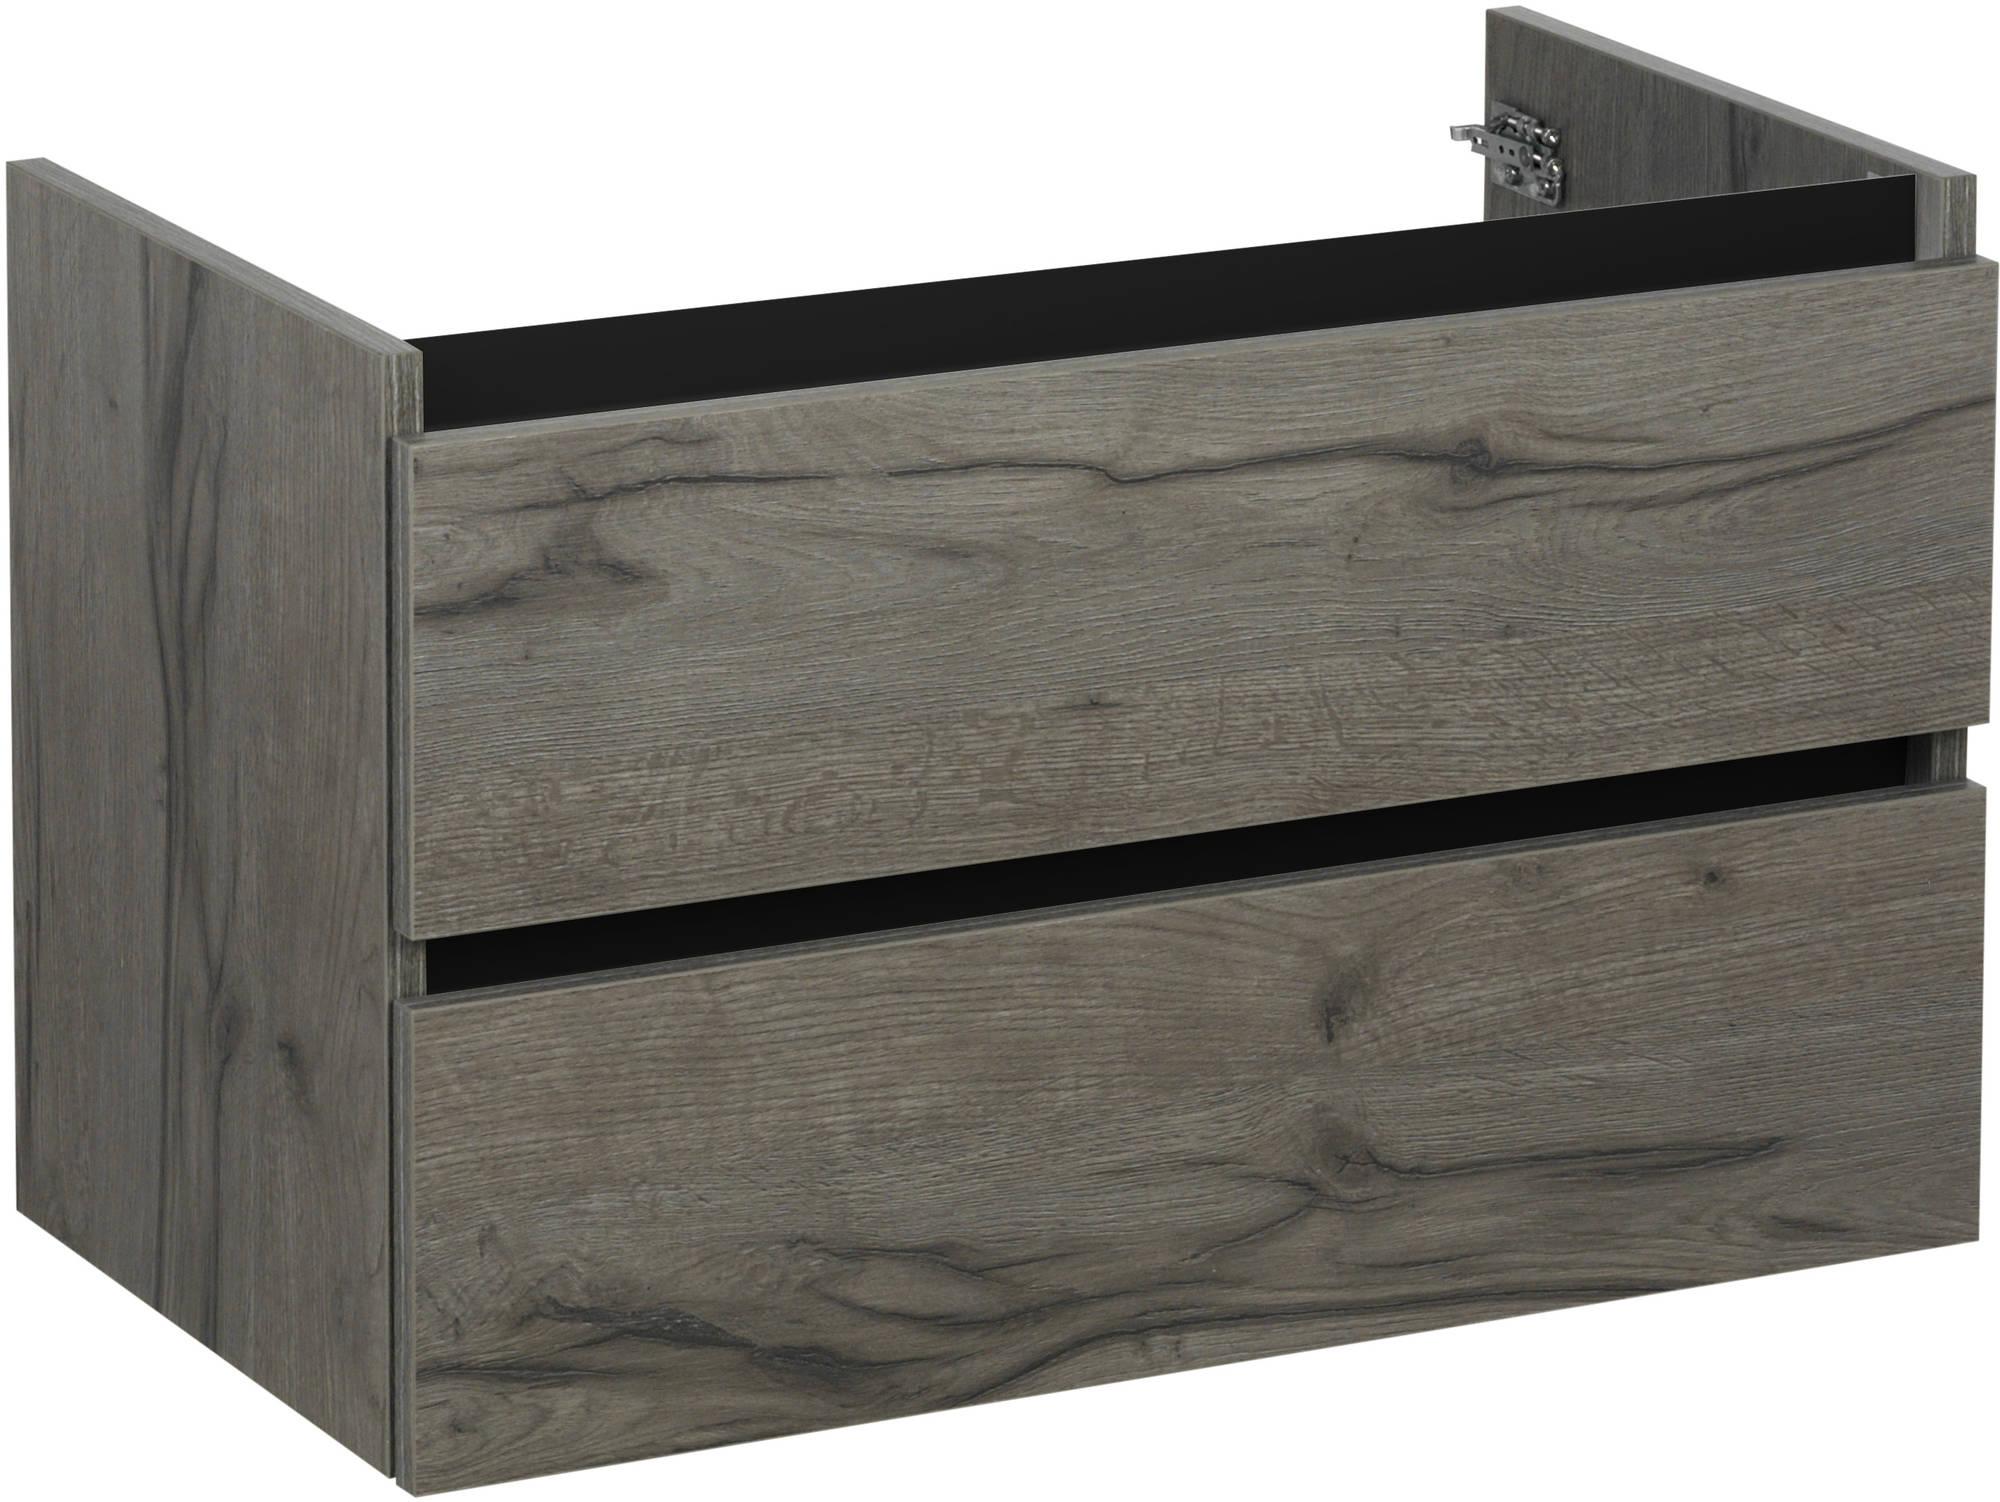 Ben Limara Wastafelonderkast 2 laden, 60x44,5x50 cm, Cape Elm/Mat Zwart